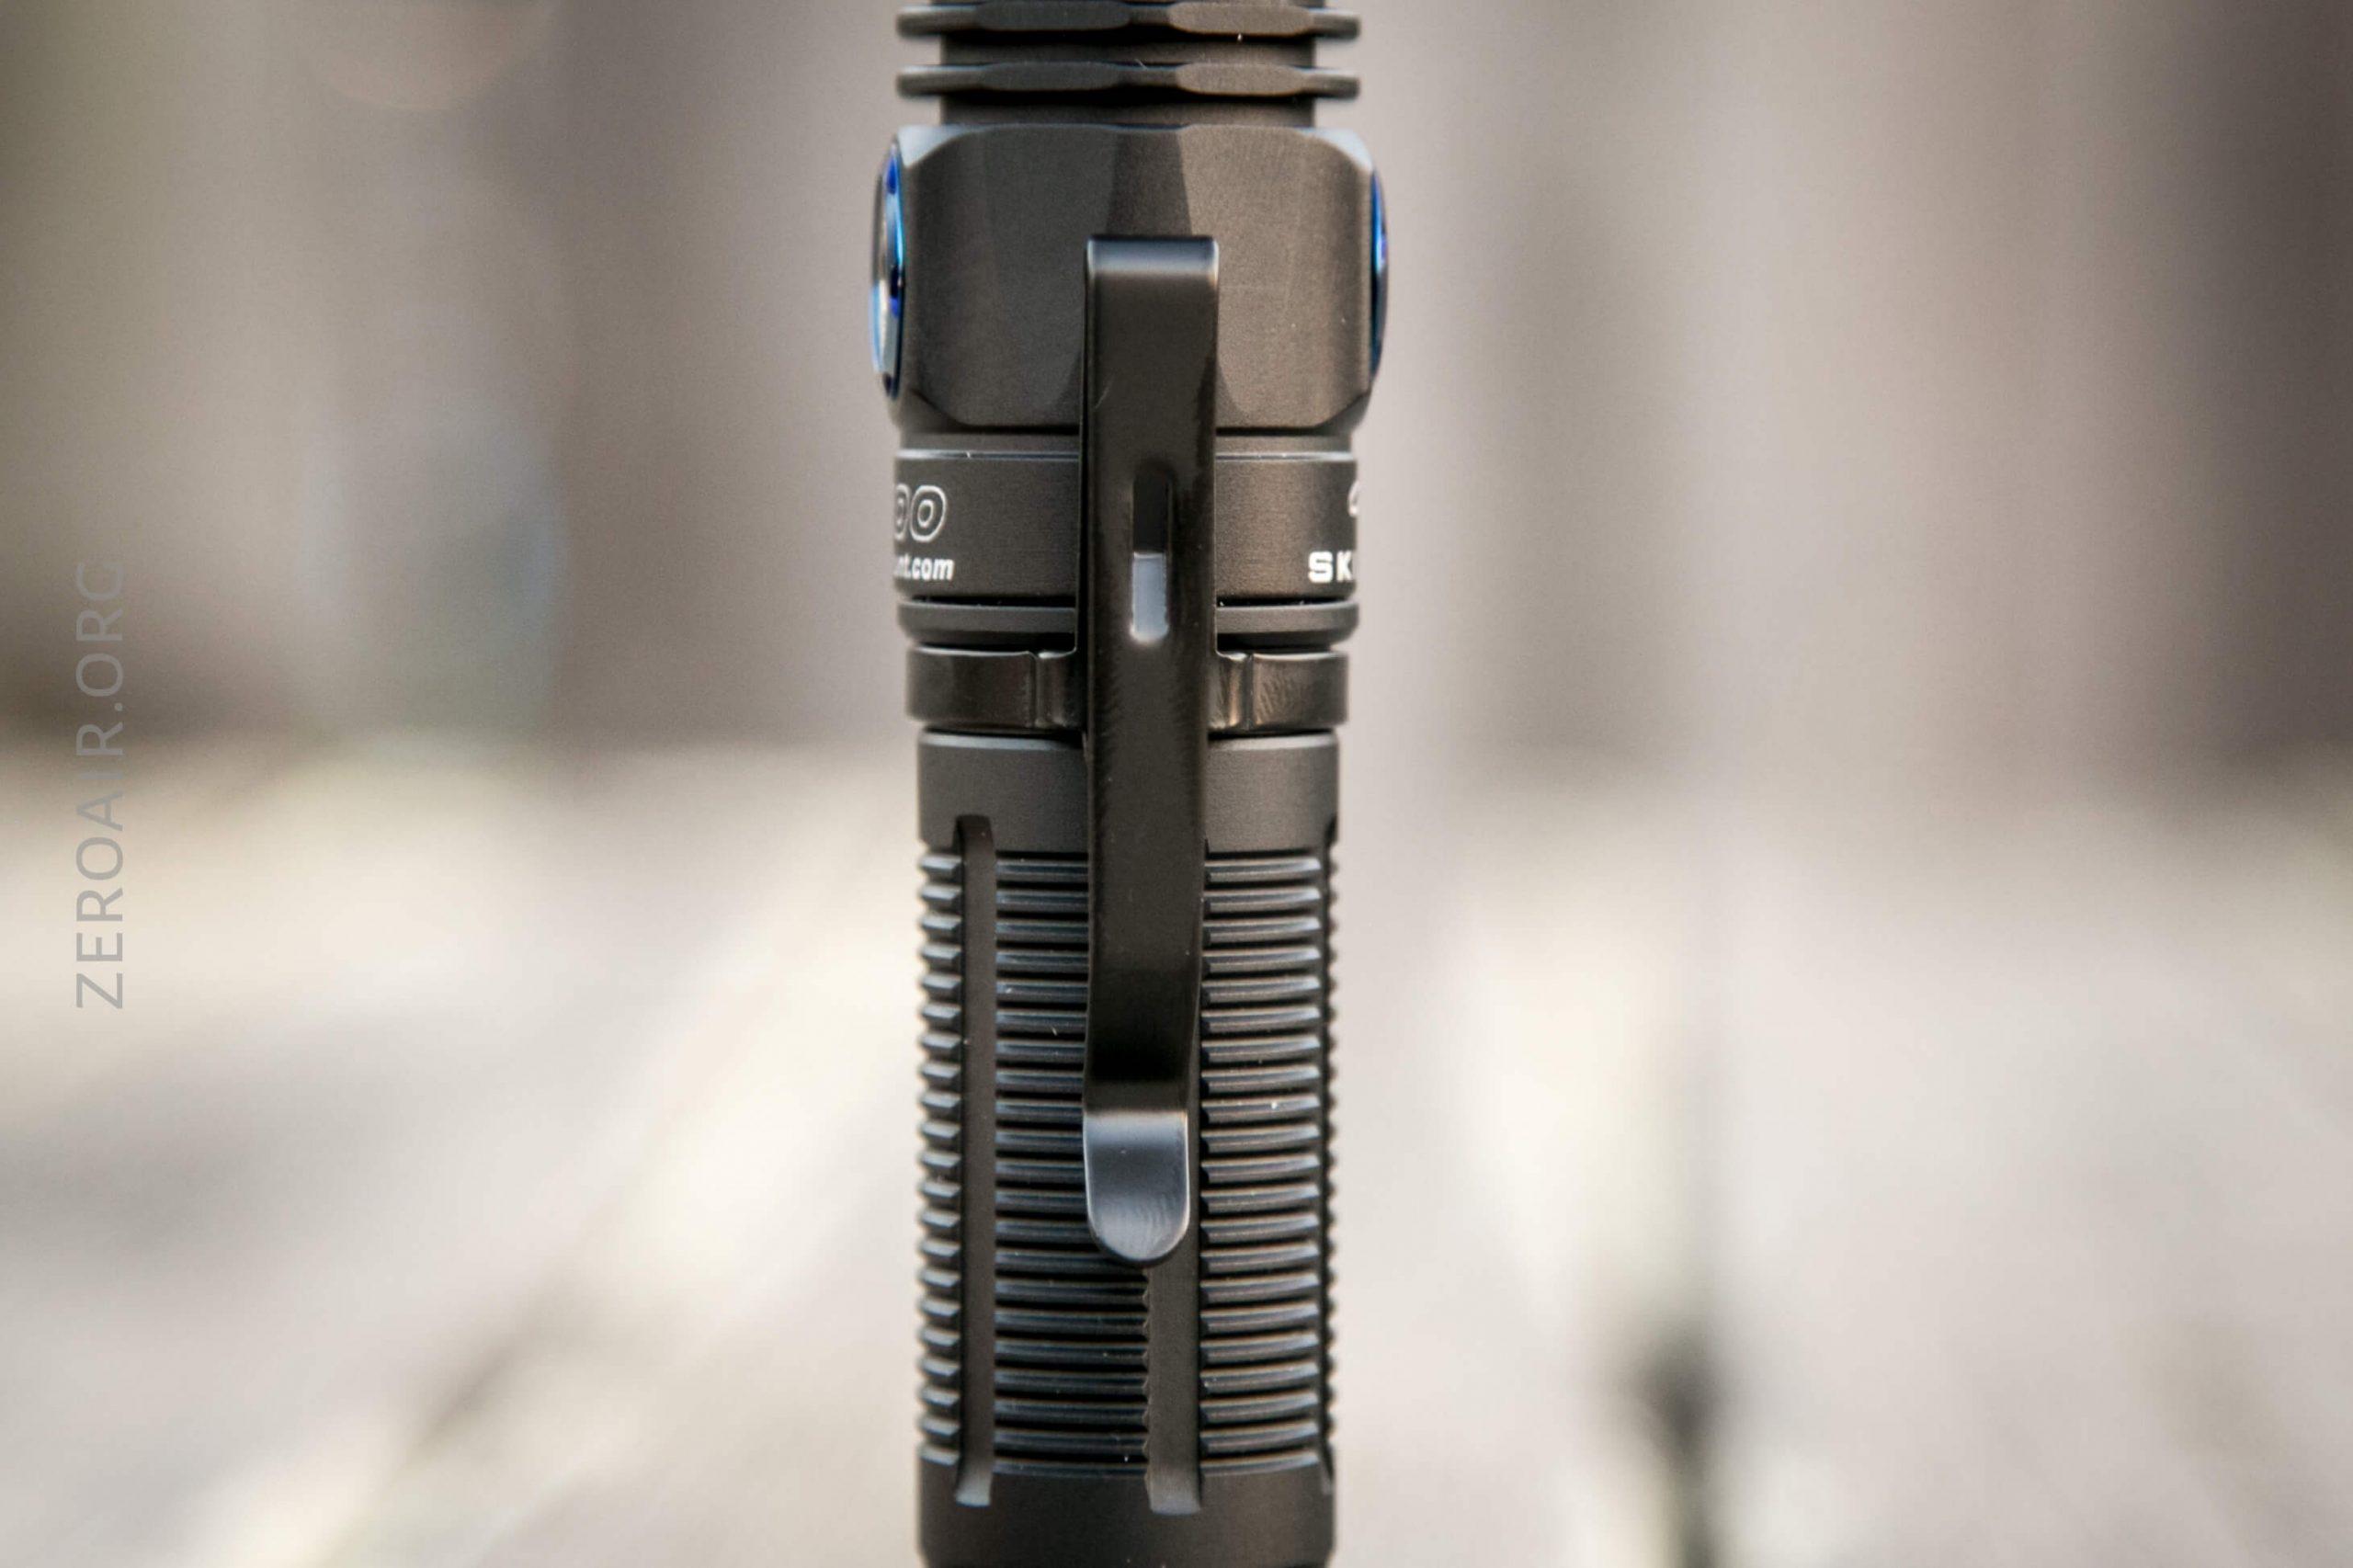 Skilhunt M200 Flashlight